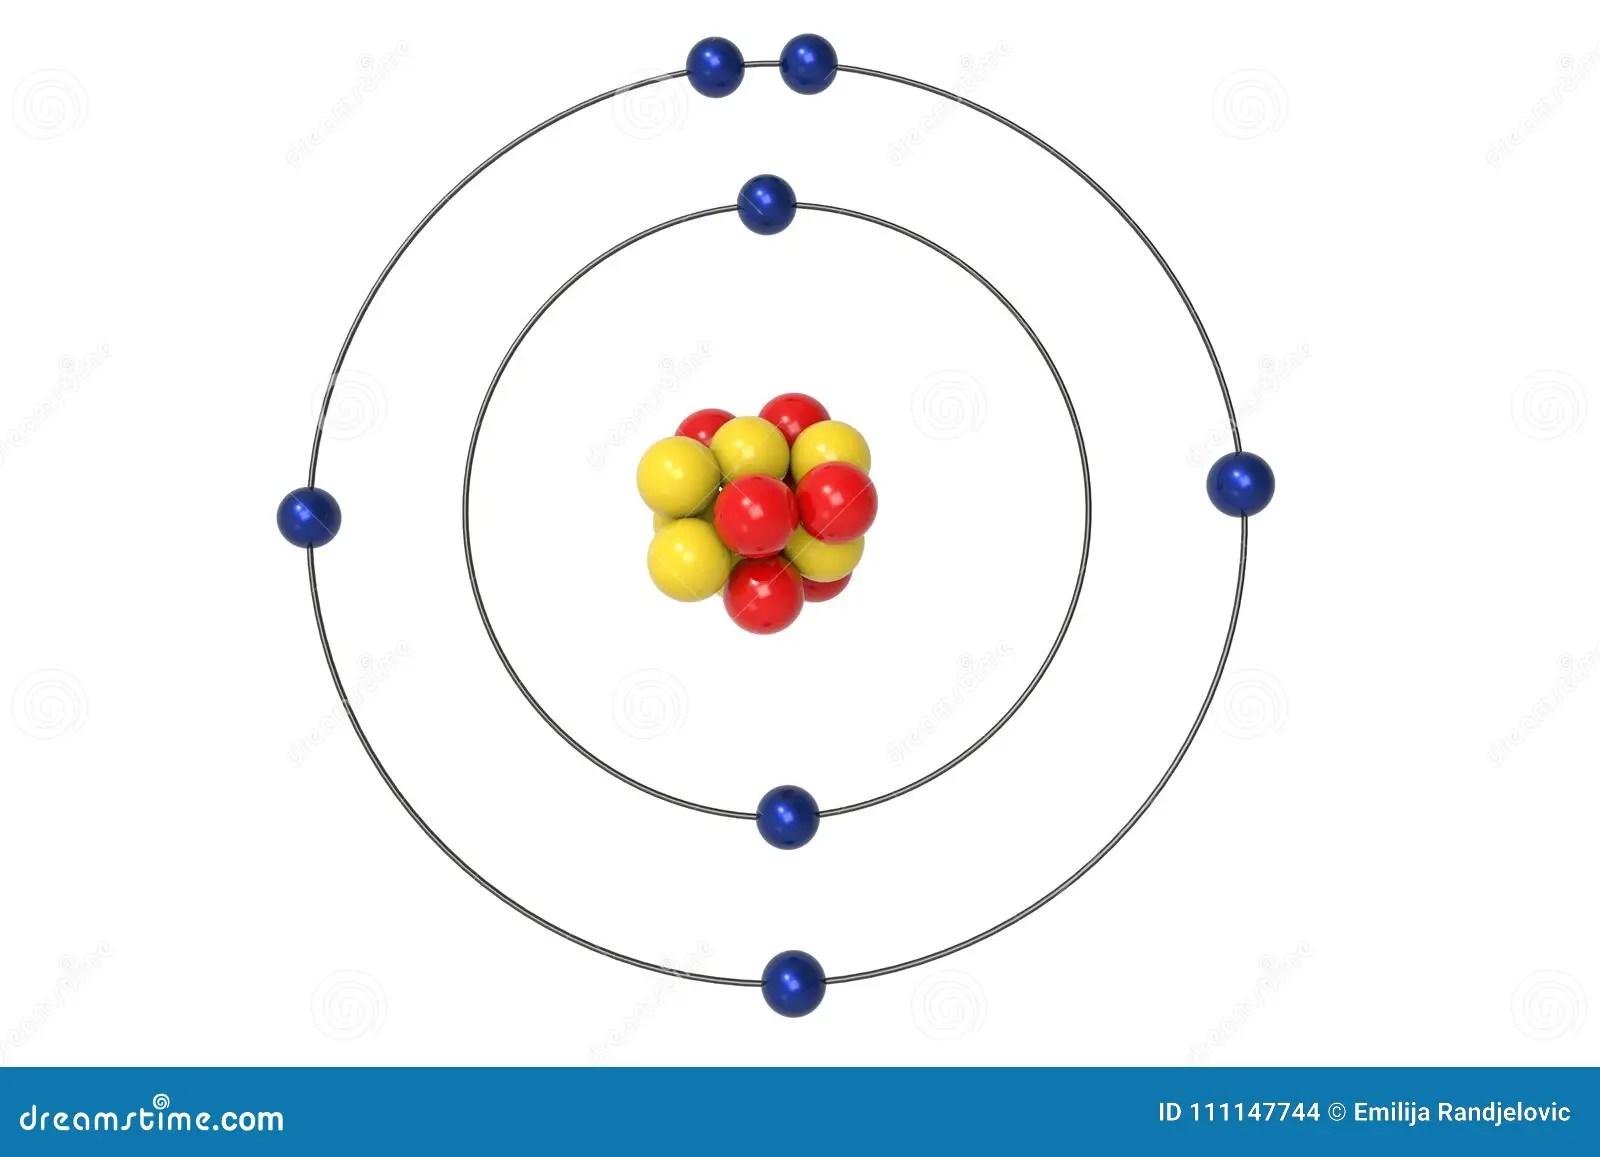 hight resolution of nitrogen atom bohr model with proton neutron and electron